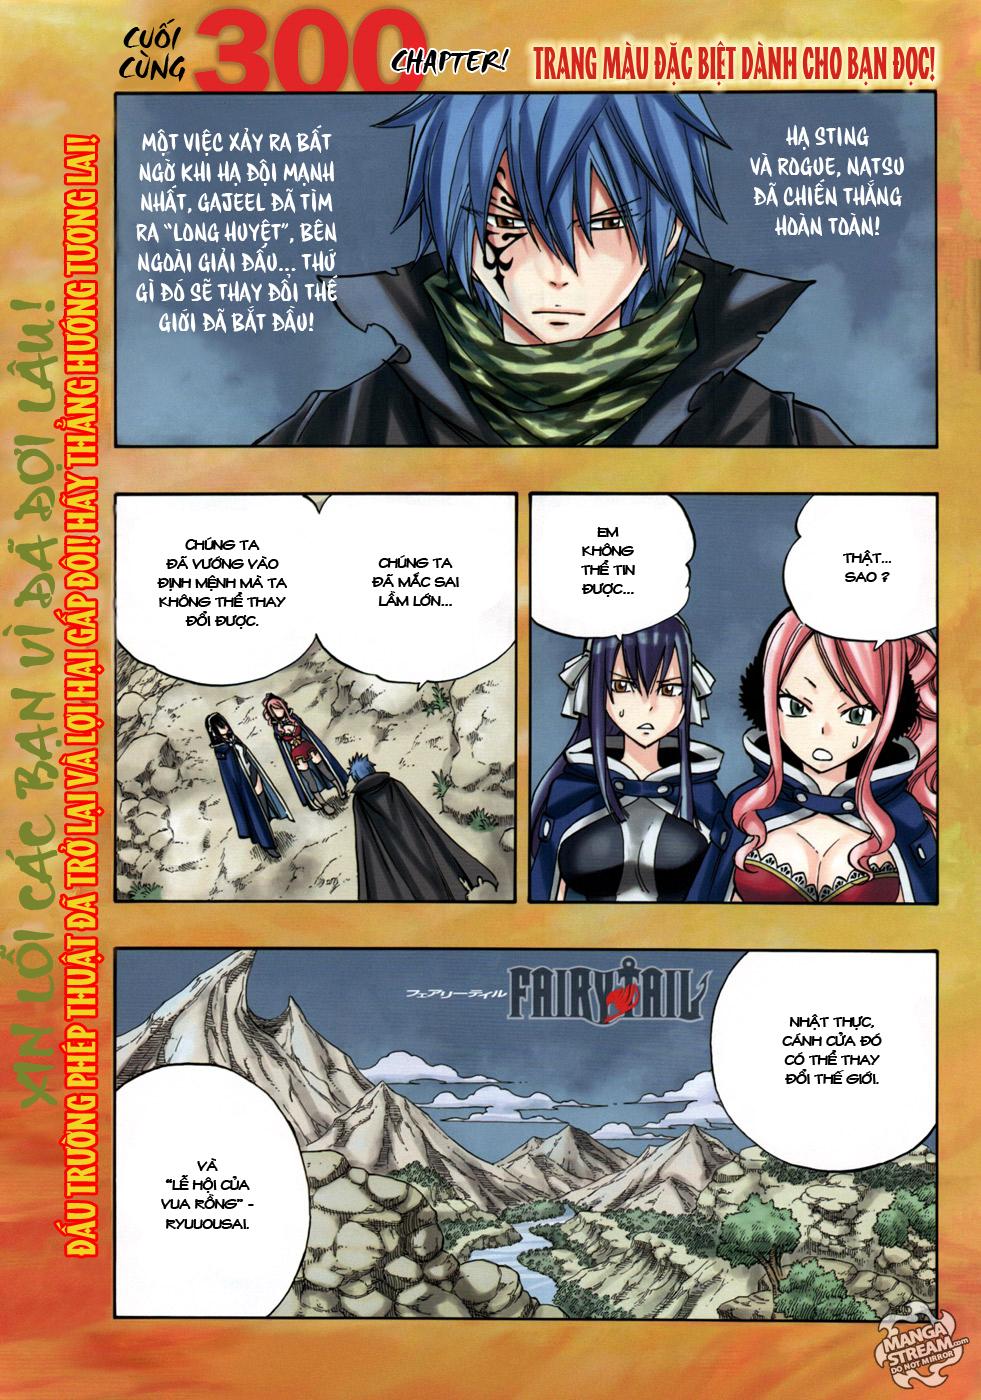 Fairy Tail chap 300 trang 1